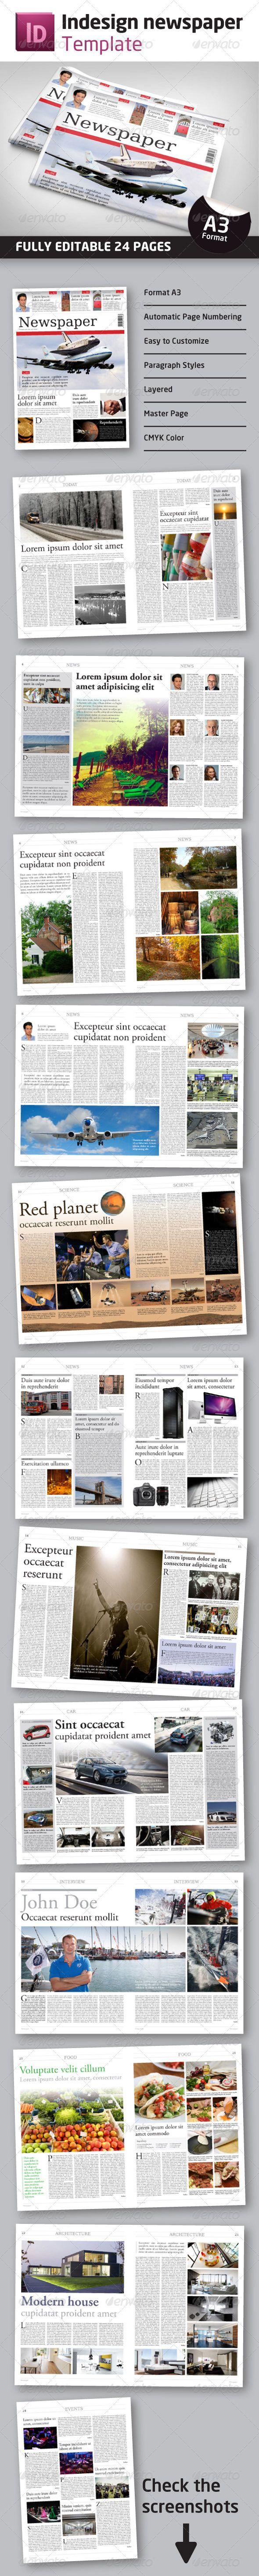 23 best Newspaper Templates images on Pinterest | Editorial design ...